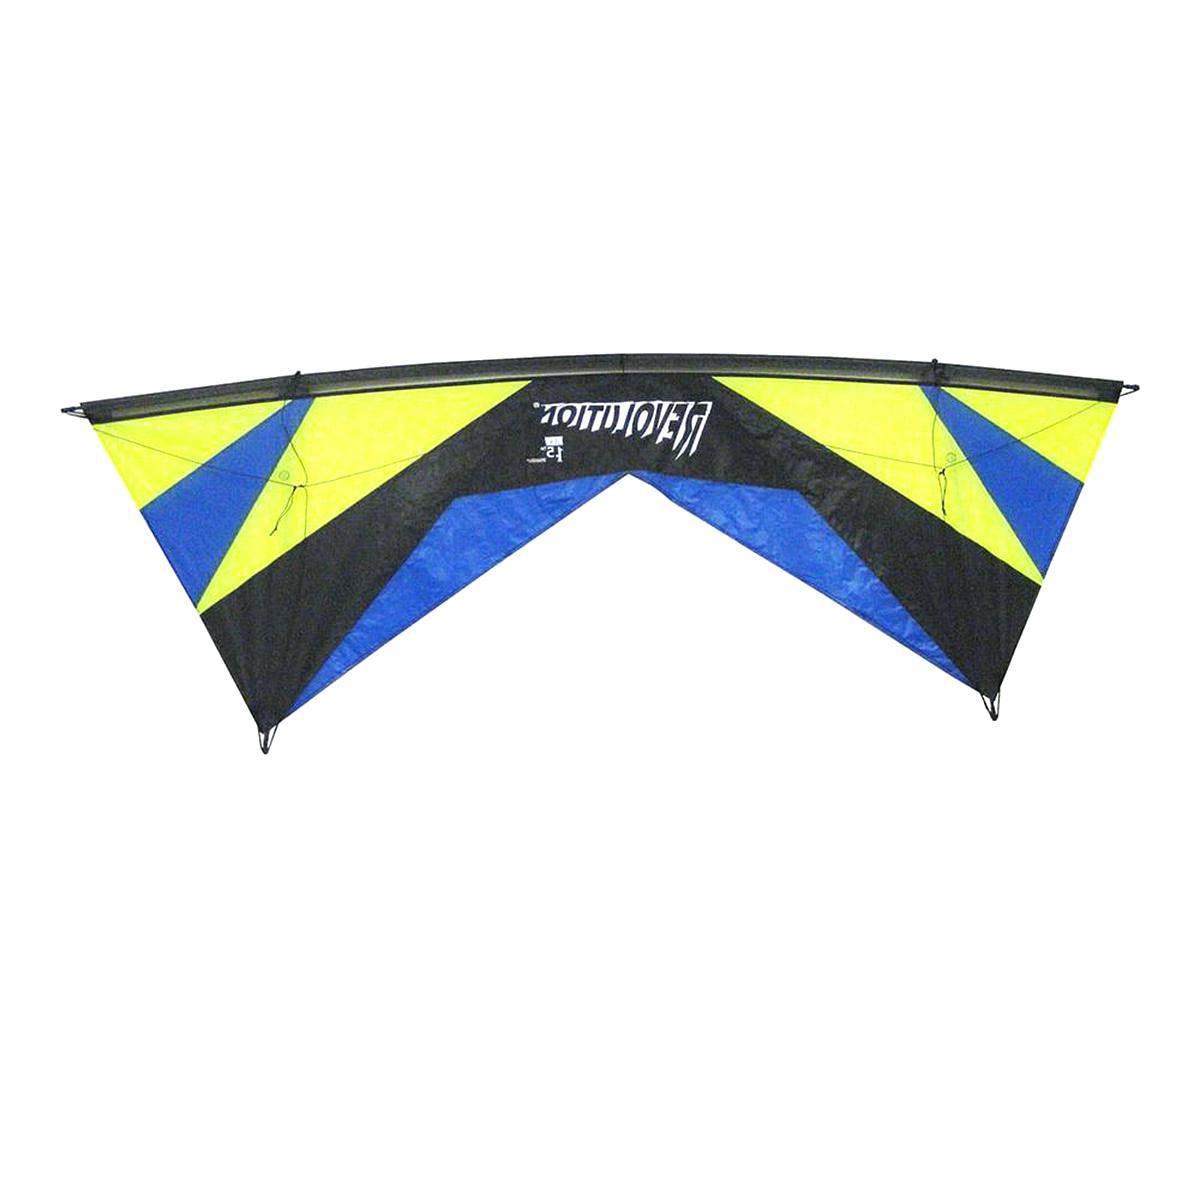 quad kite for sale